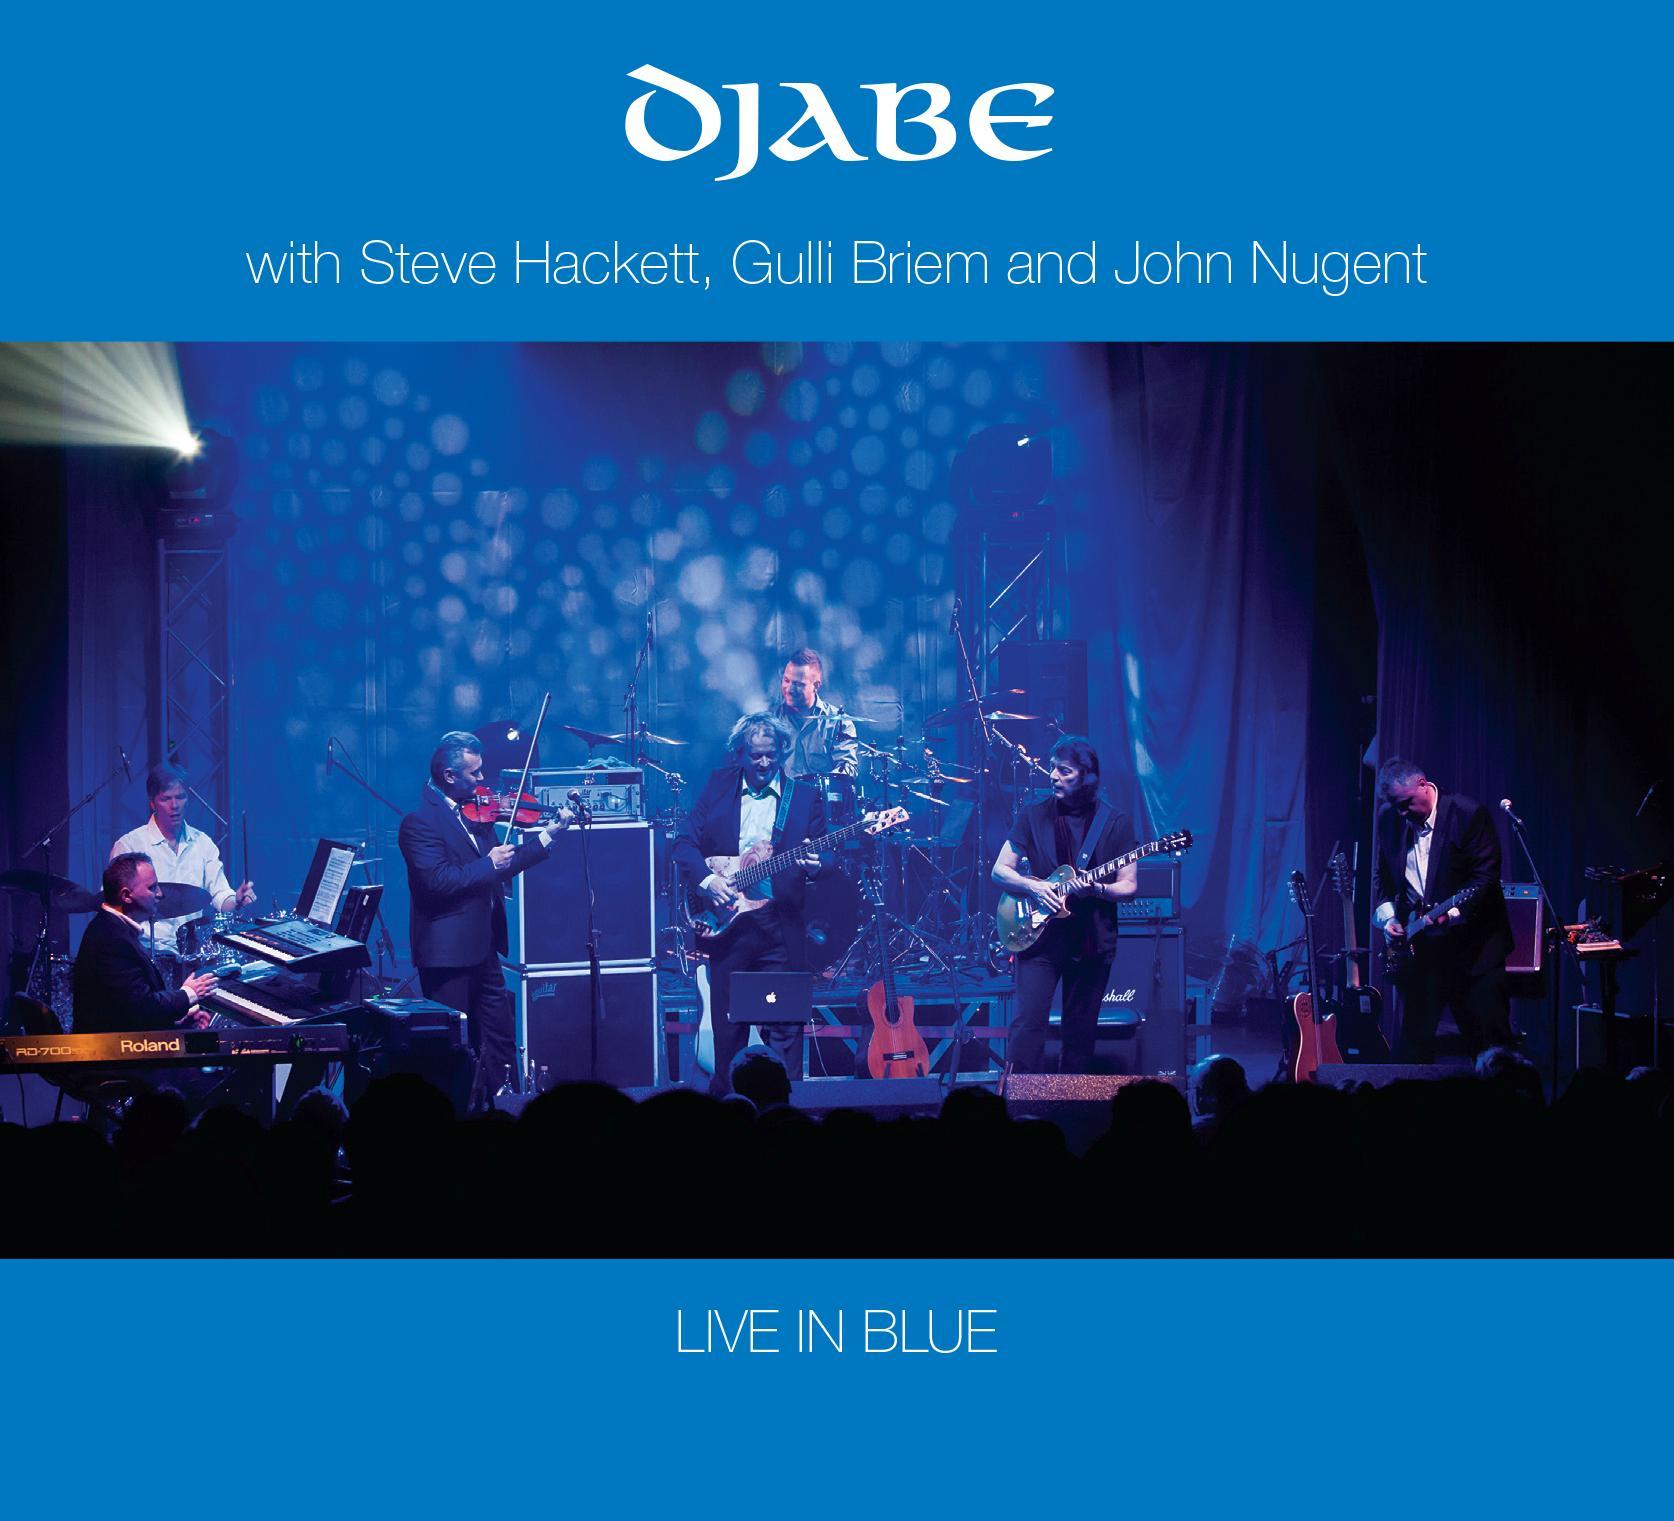 LIVE IN BLUE  - DJABE - 2CD -